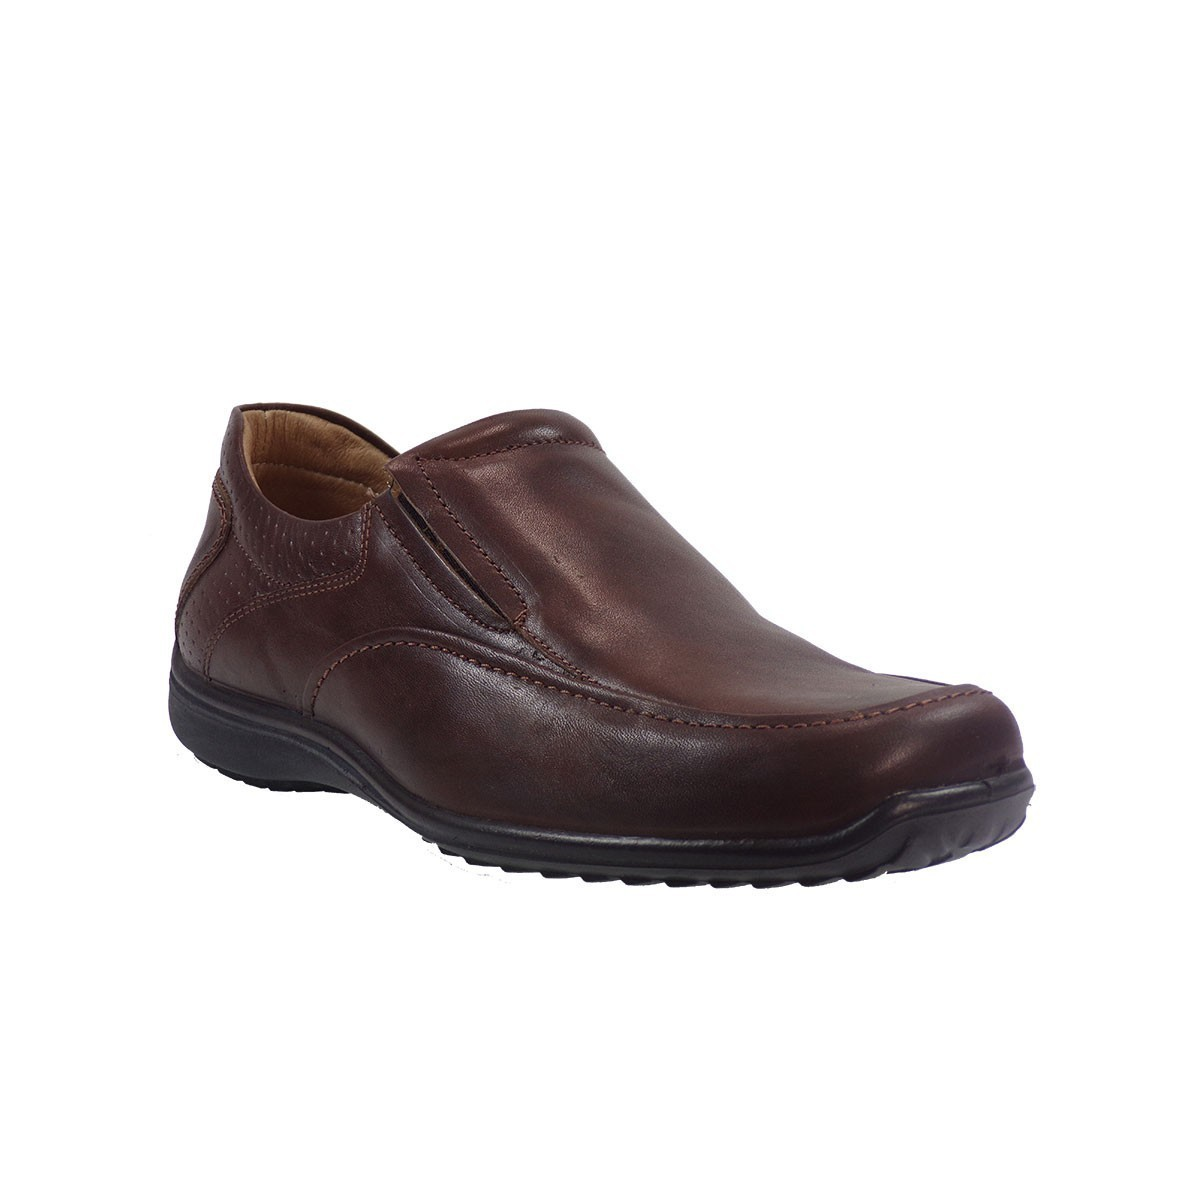 Aeropelma Duetto Ανδρικά Παπούτσια 608 Καφέ Δέρμα